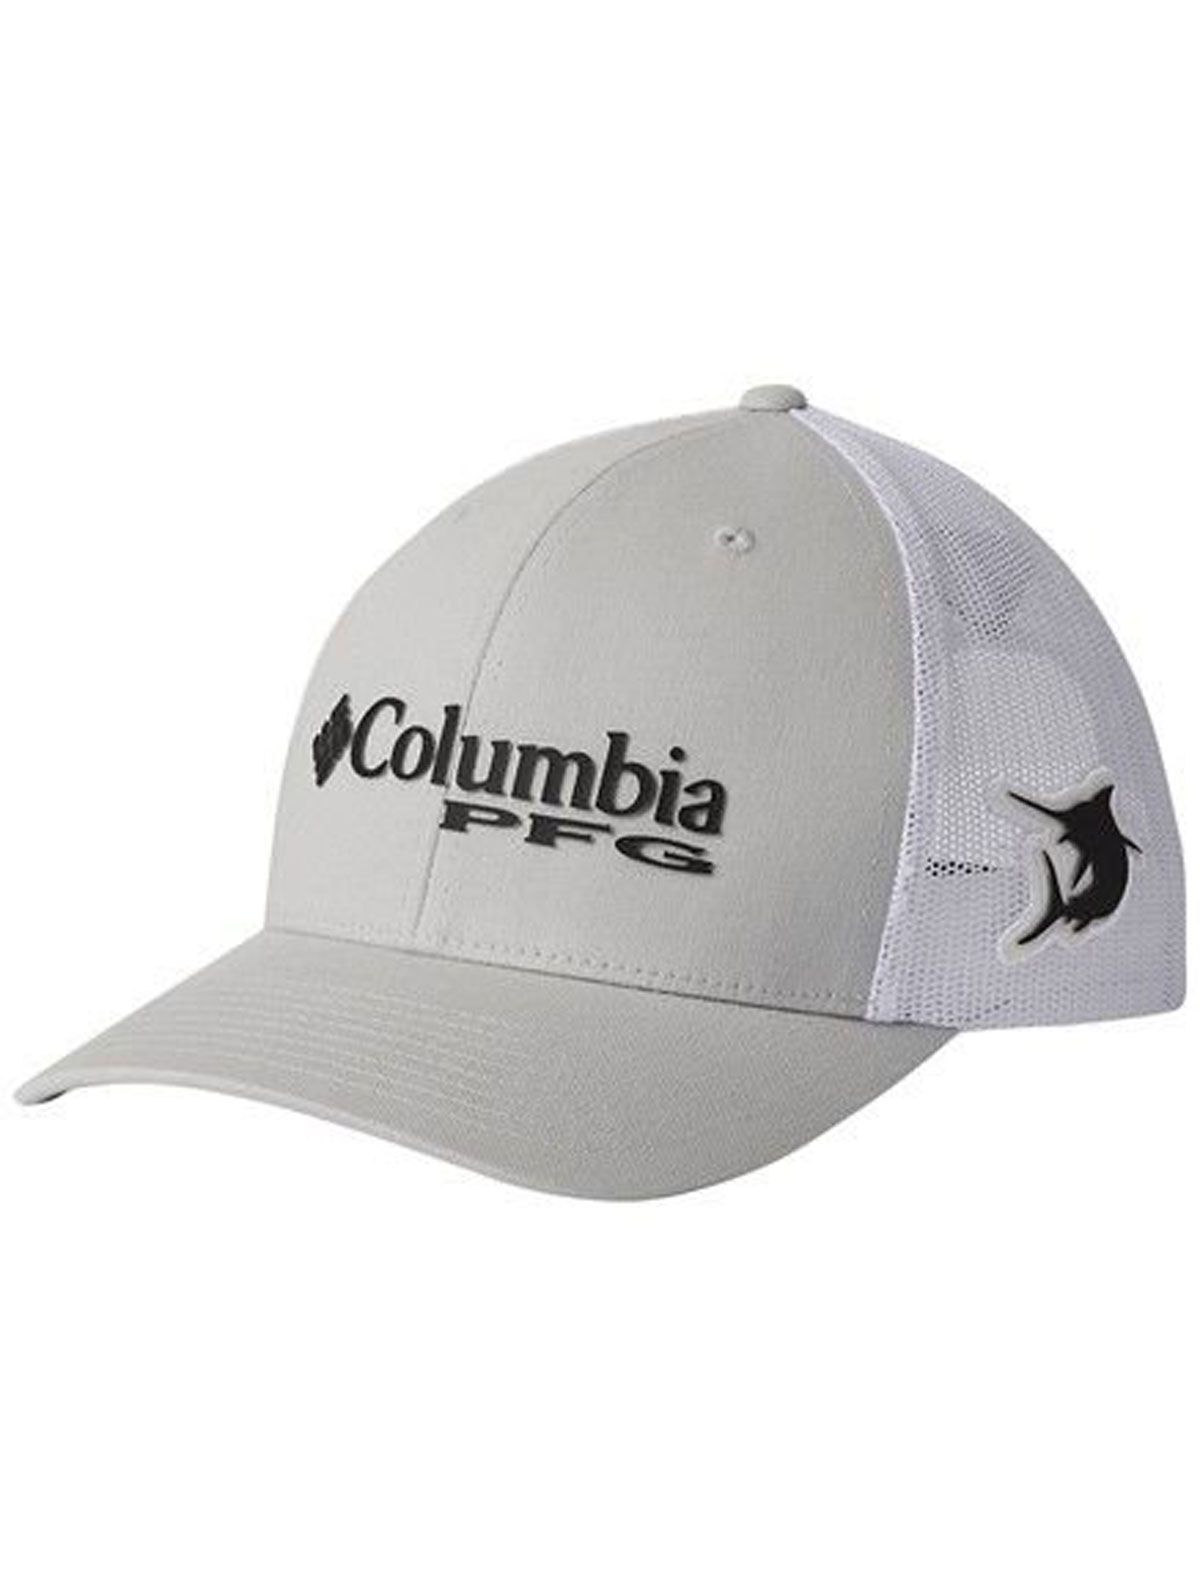 Boné Columbia PFG Mesh Snap Back Ball Cap - Cinza e Branco